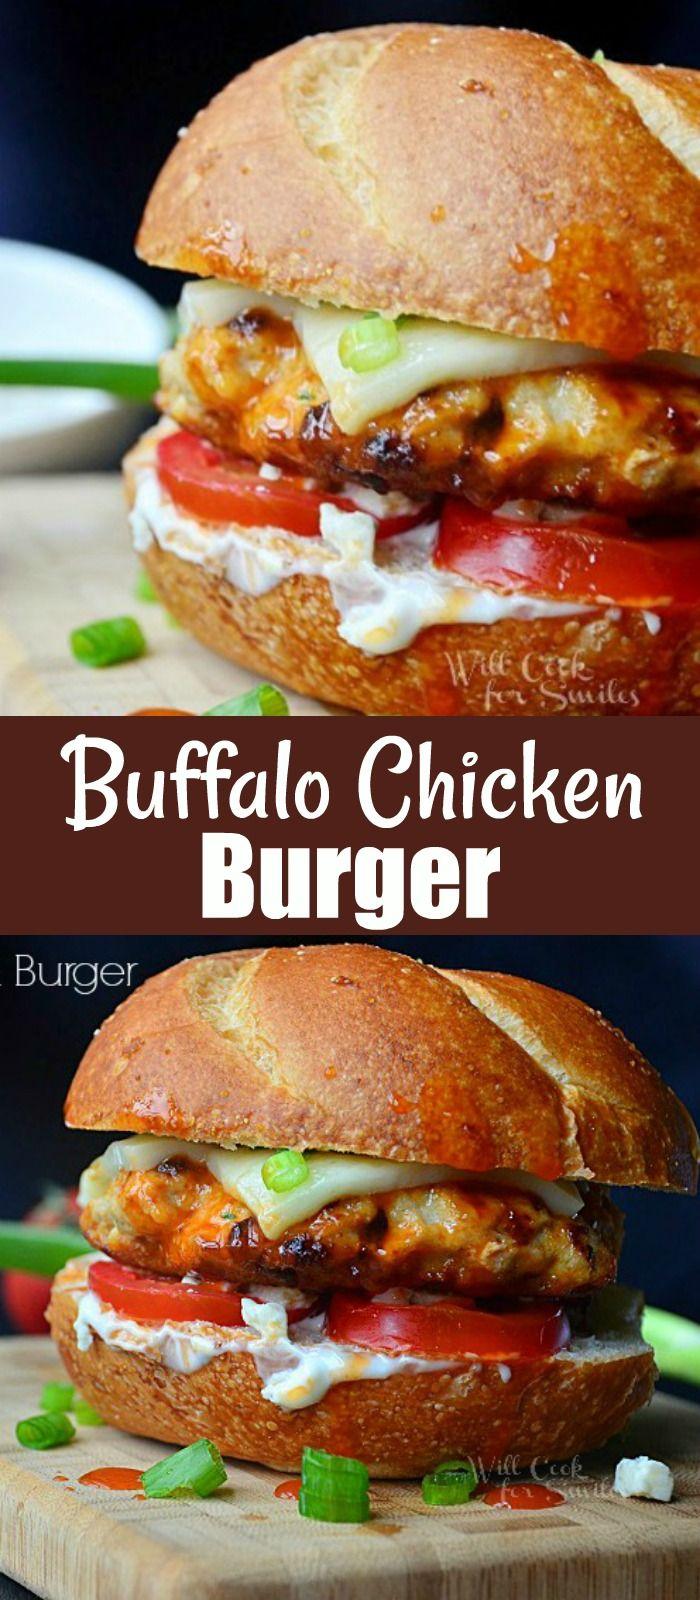 Buffalo Chicken Burger In 2020 Chicken Burgers Buffalo Chicken Burgers Grilling Recipes